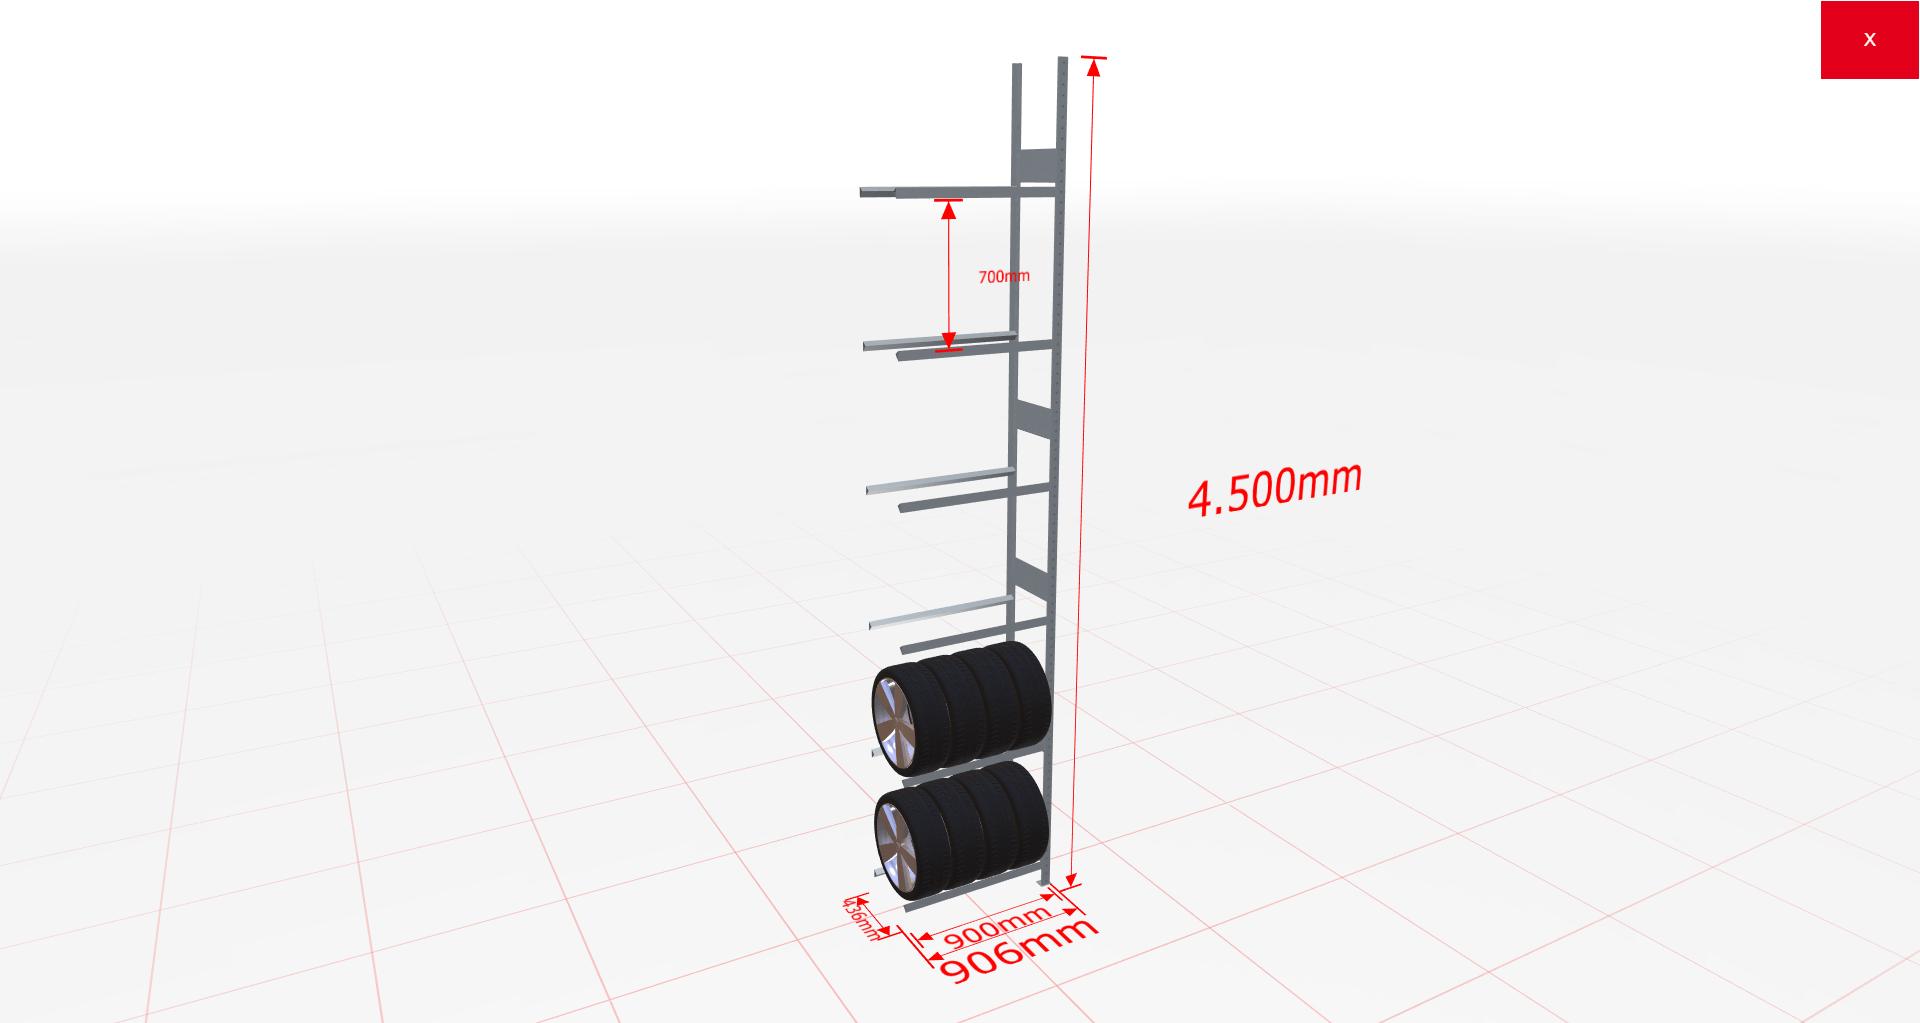 Räderregal Anbauregal SCHULTE Lagertechnik 4500x900x400 mm – 6 Ebenen á 900 mm, verzinkt